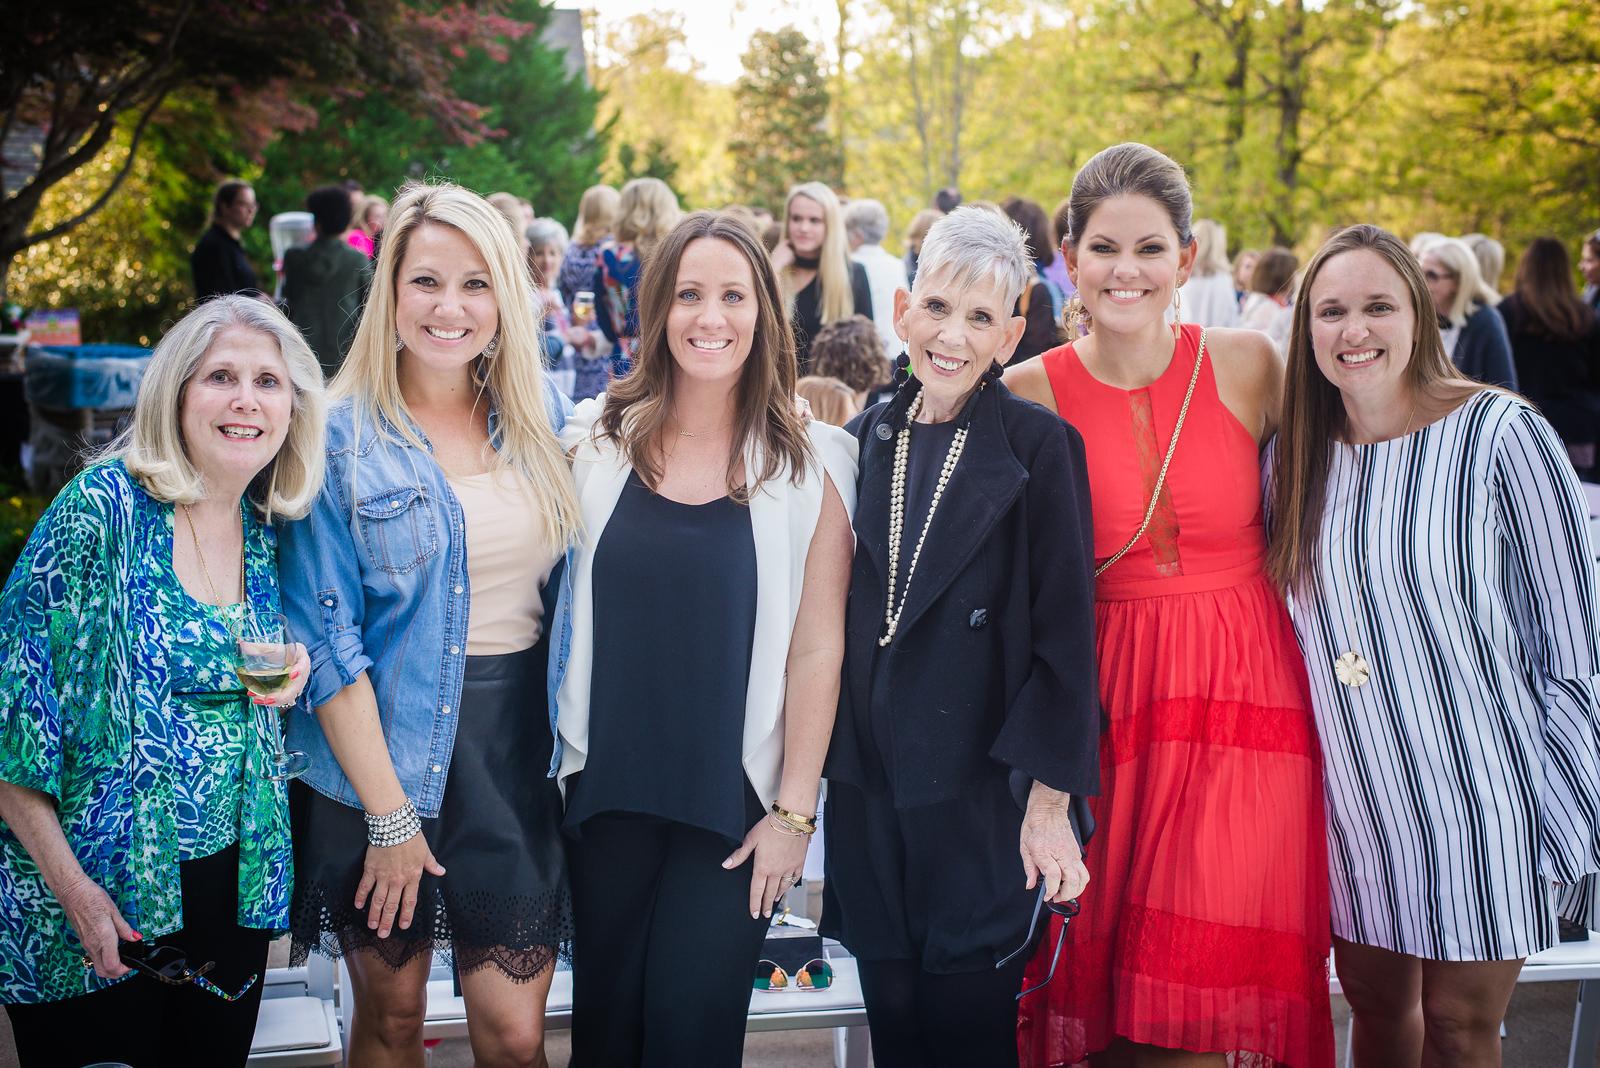 Carolynb Frank, Kathryn Kitchens, Paige Hatfield, Janna Laughlin, Emily Cobb, Melissa Mansfield